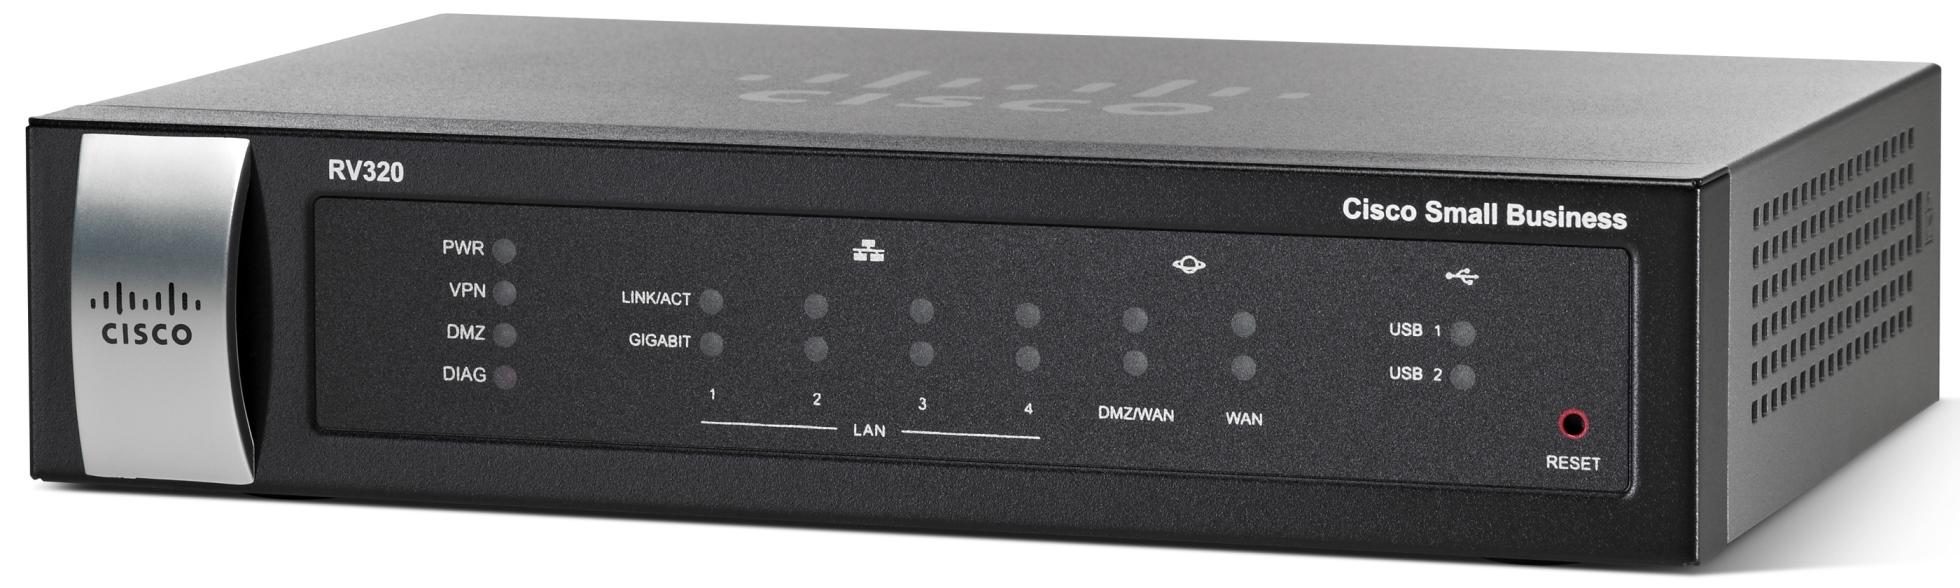 Cisco RV320, 2x Gigabit WAN, 4x Gigabit LAN VPN Router